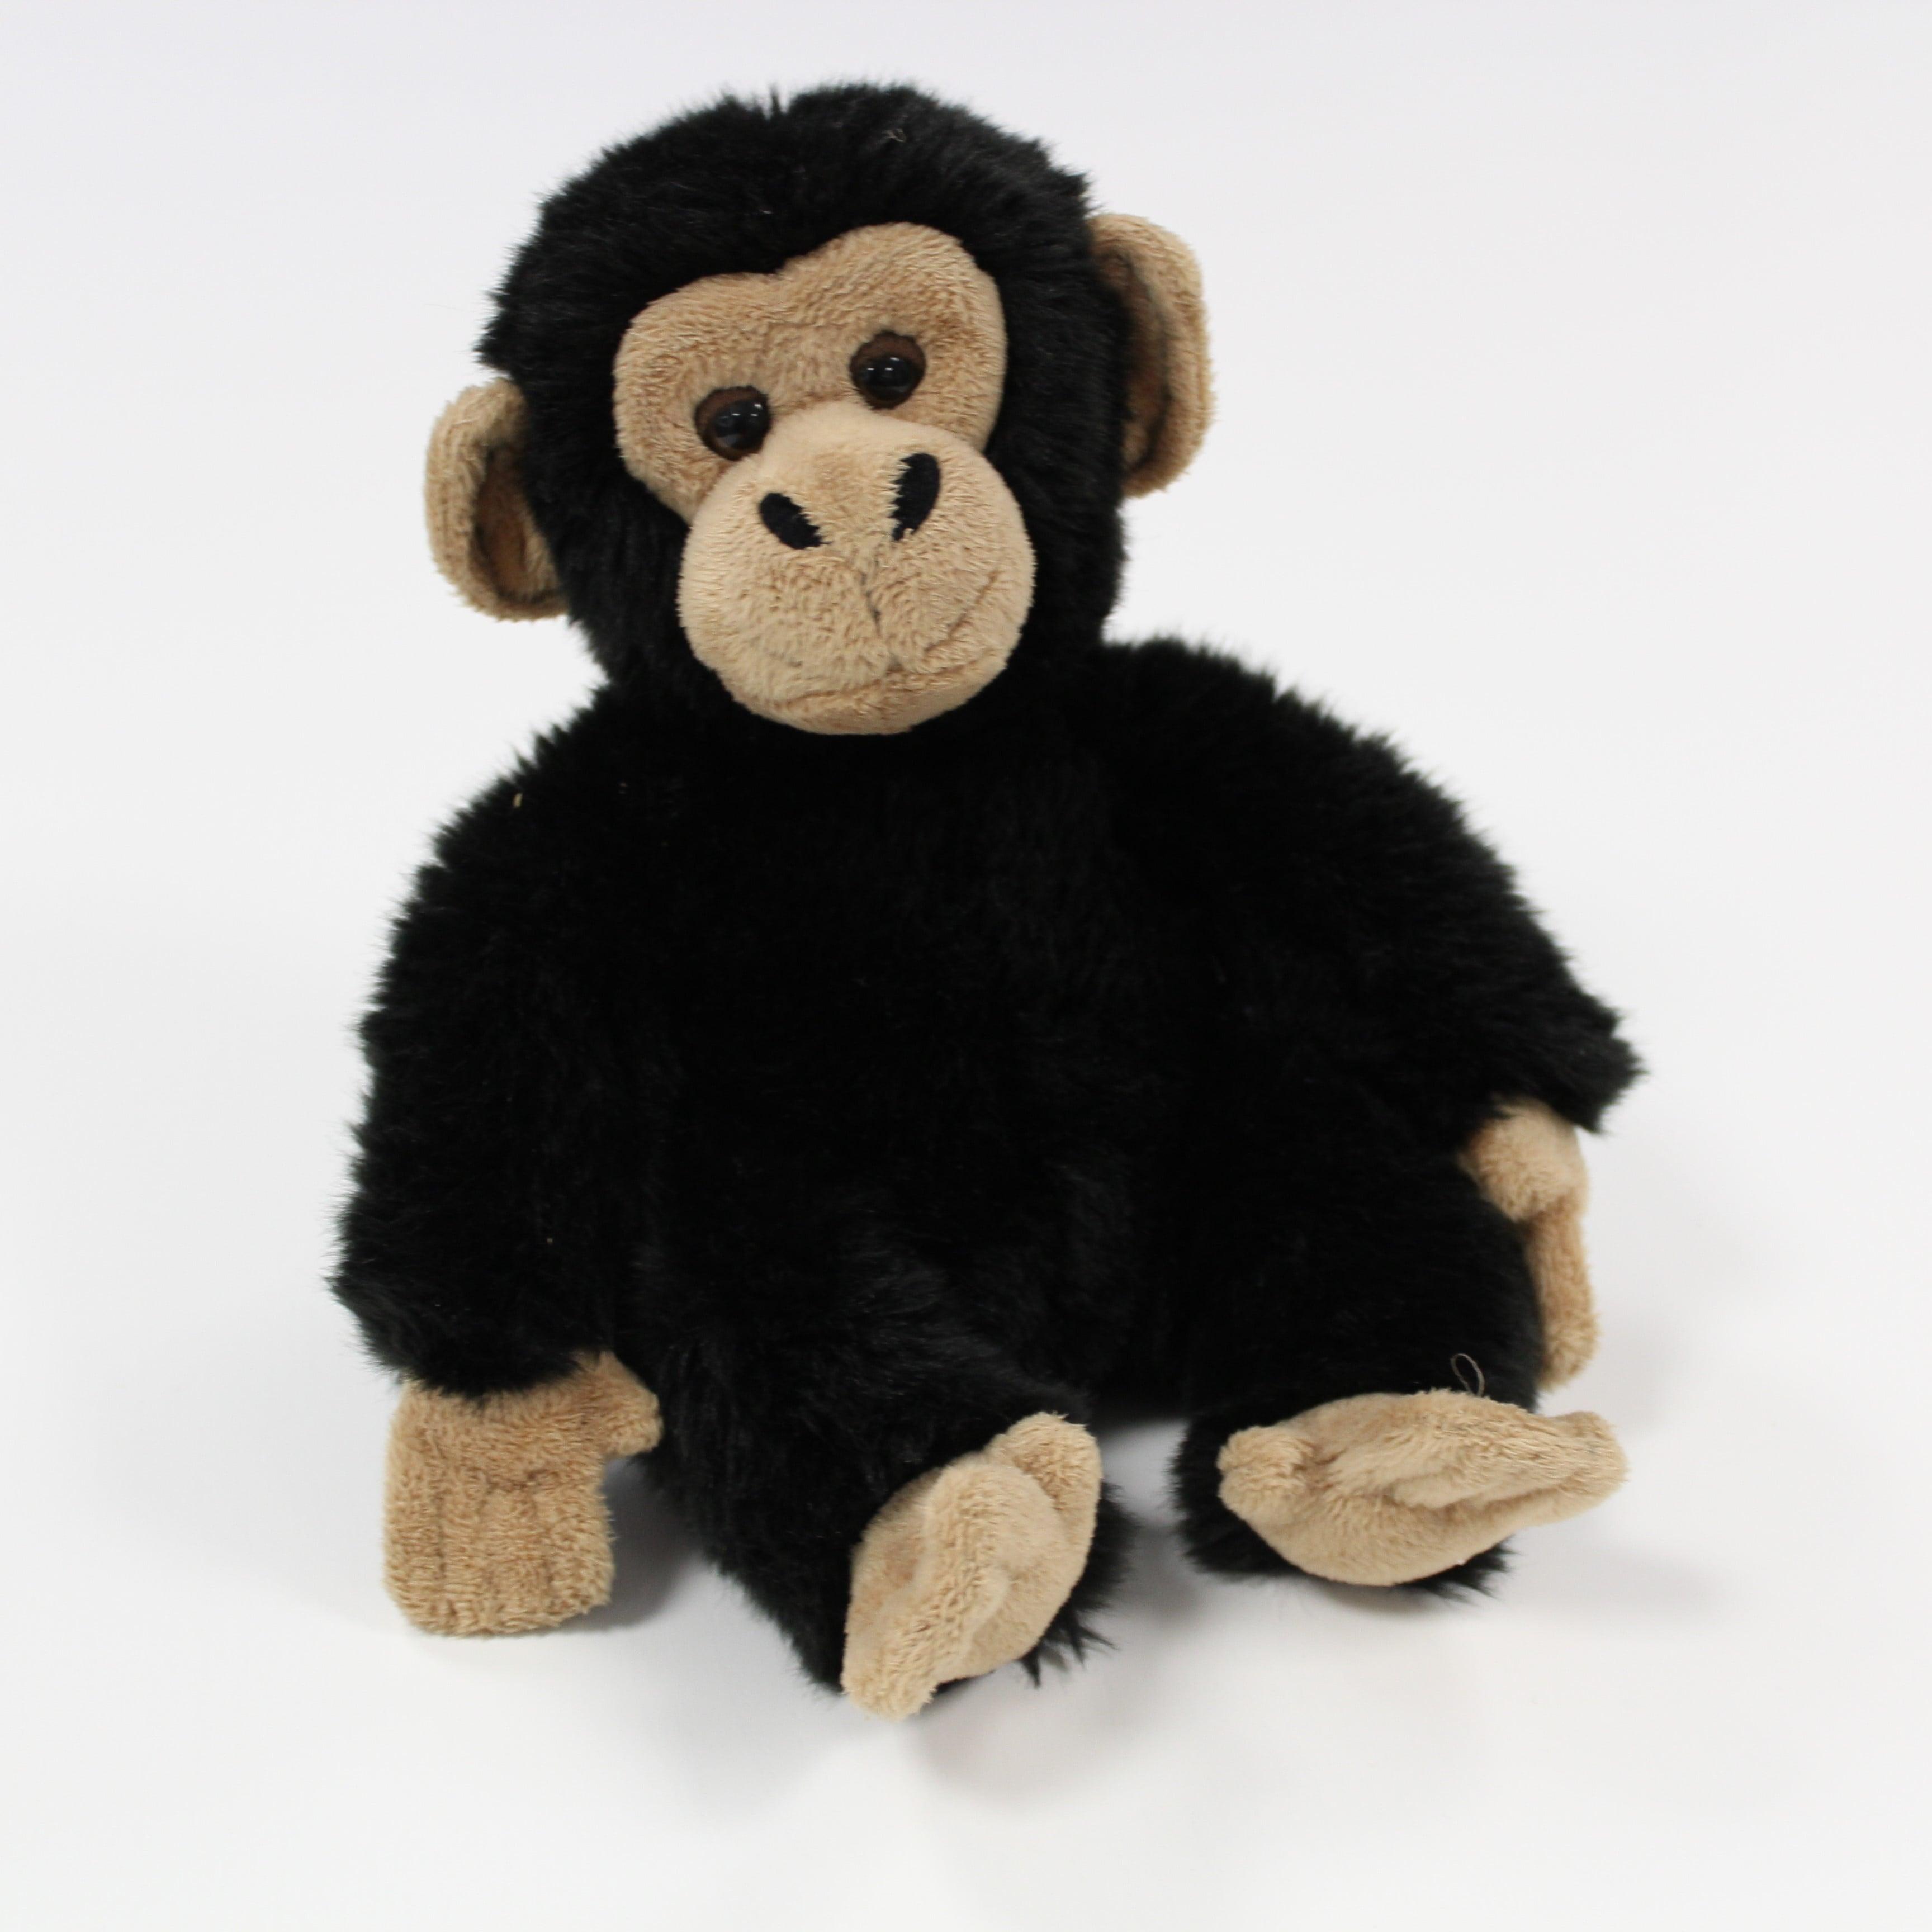 Monkey Teddy